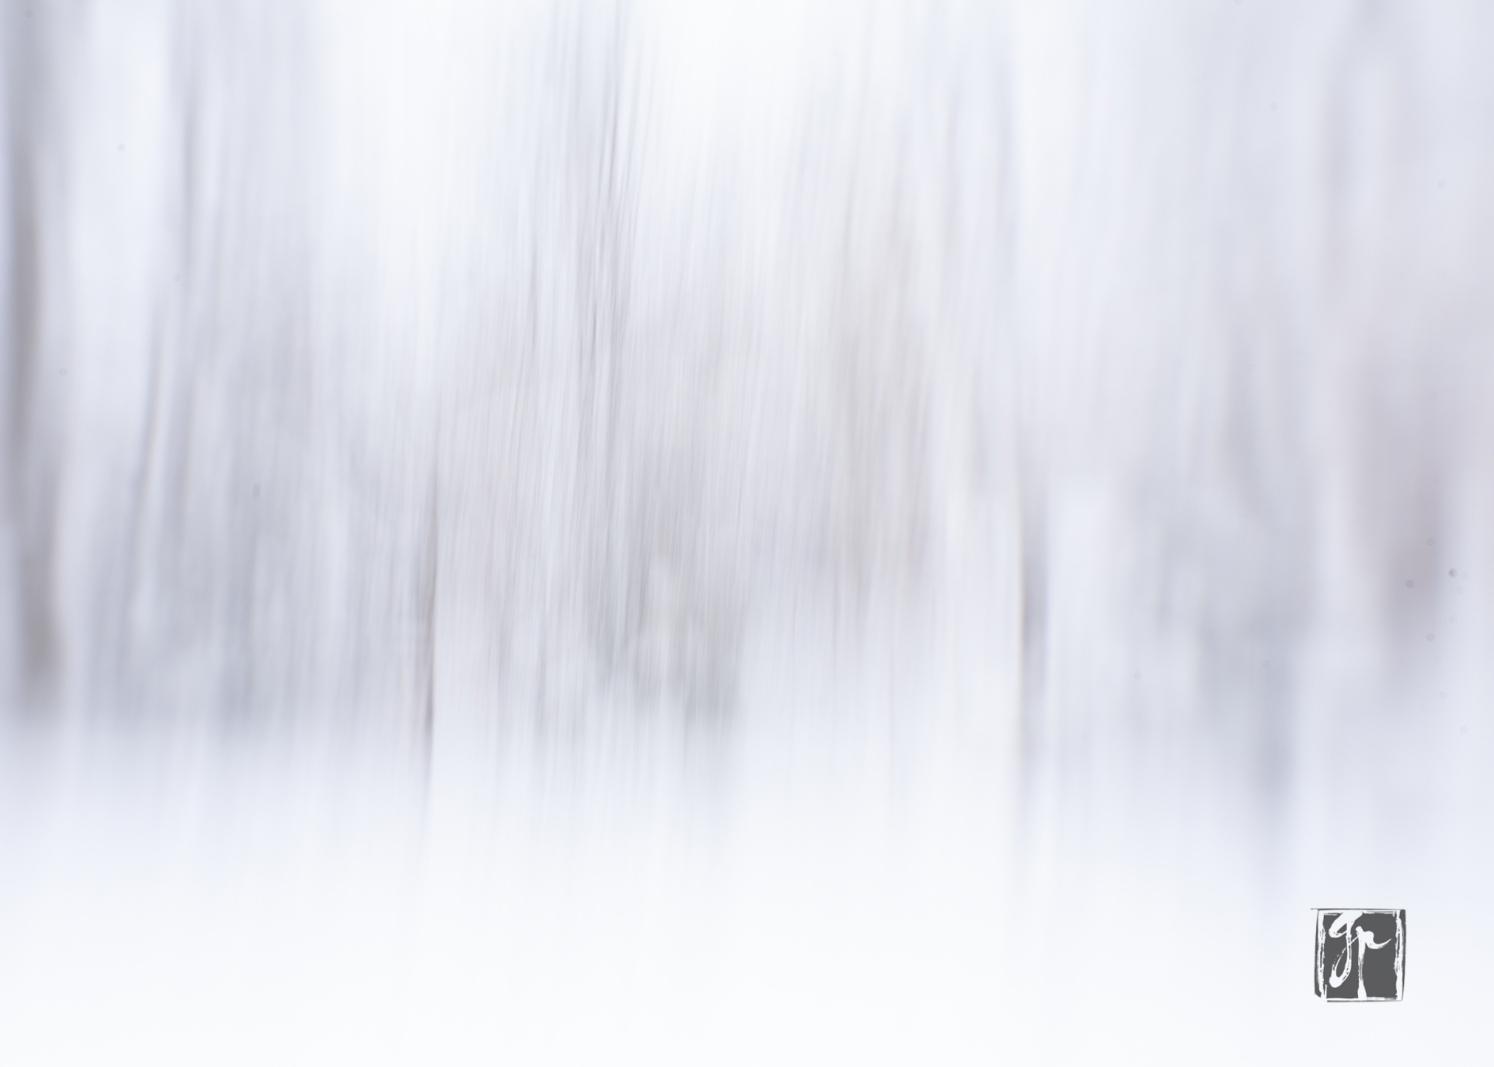 Impressionistic Snowy Day